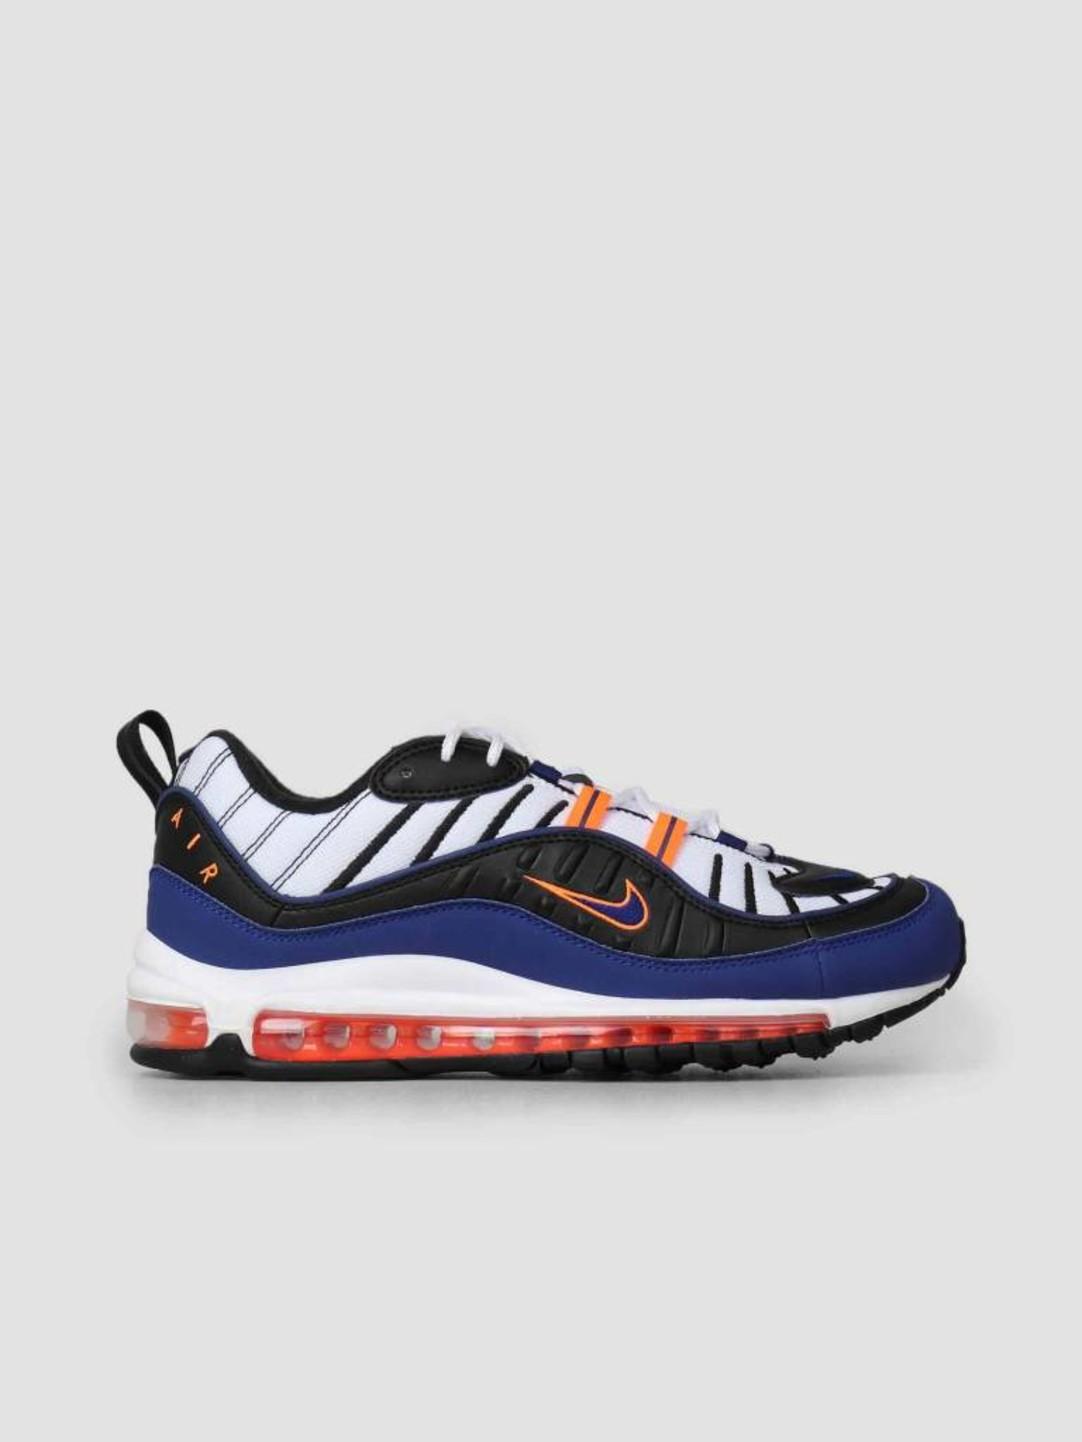 finest selection 00e5a 68009 Nike Air Max 98 White Deep Royal Blue-Total Orange-Black Cd1536-100